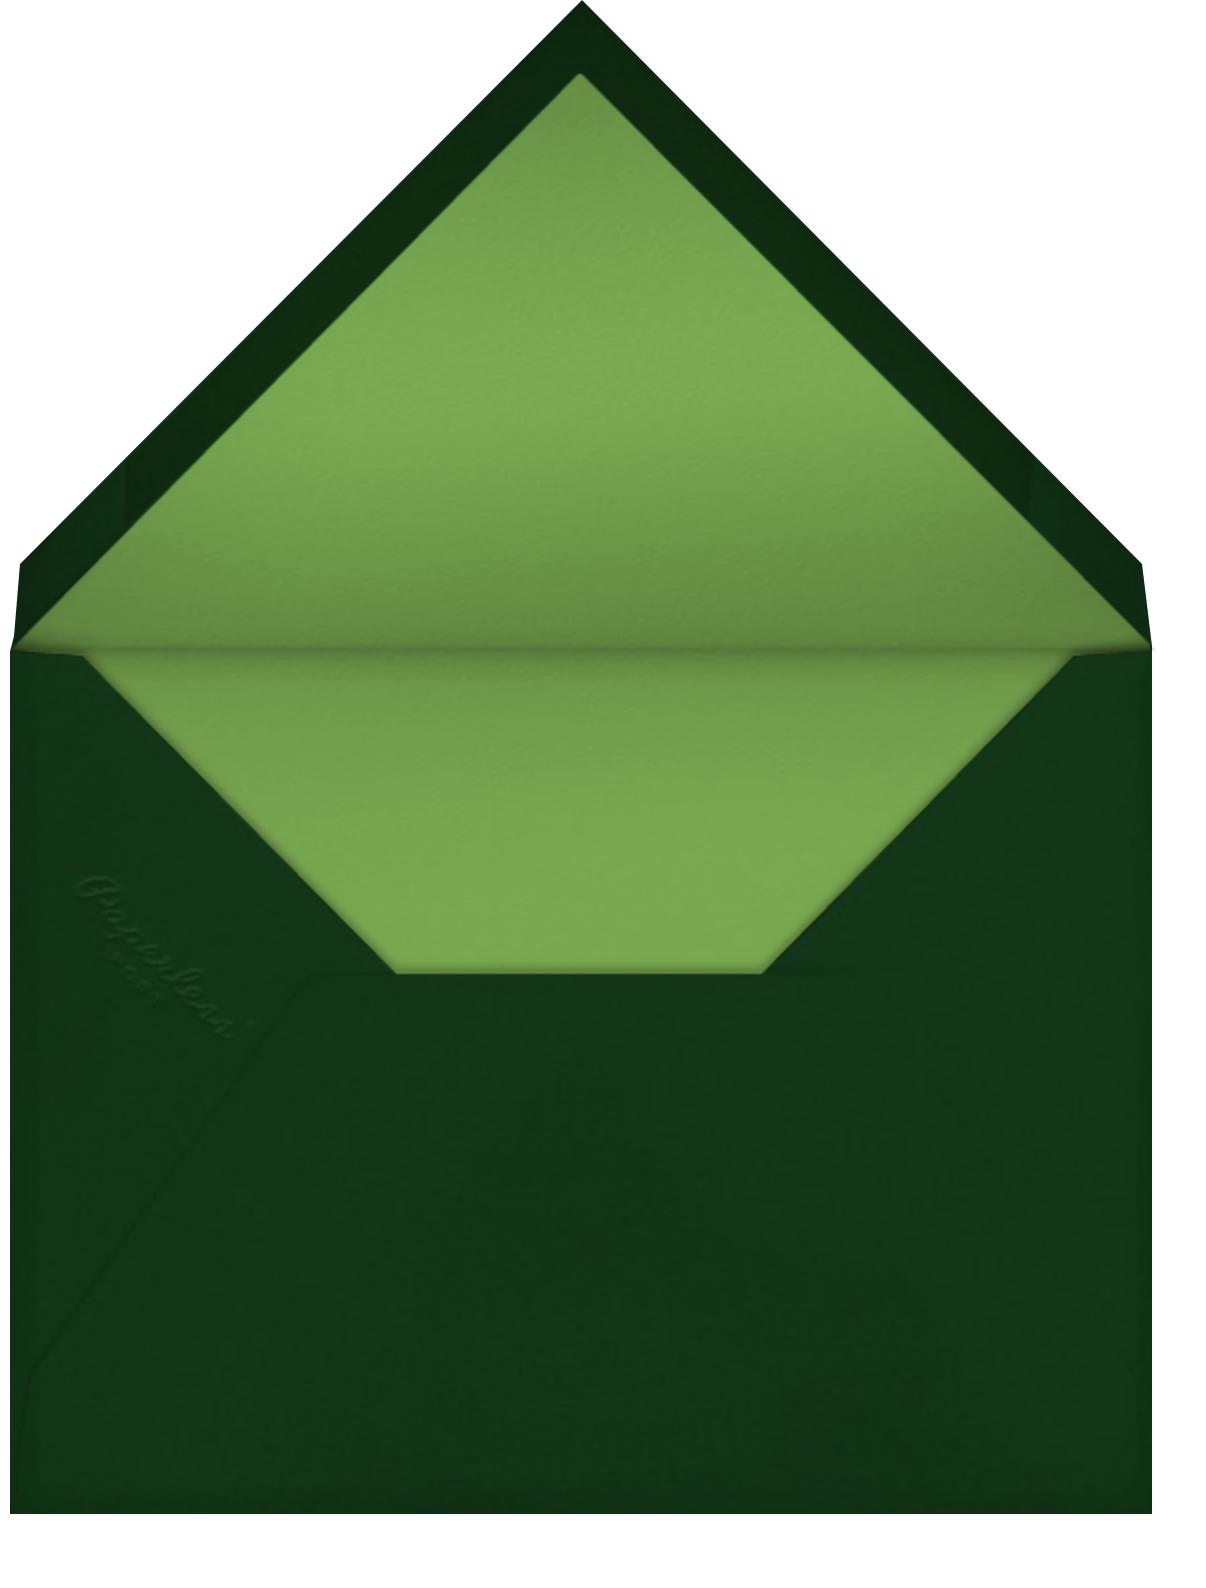 Fern II (Invitation) - Green - Paperless Post - Eventbrite - envelope back